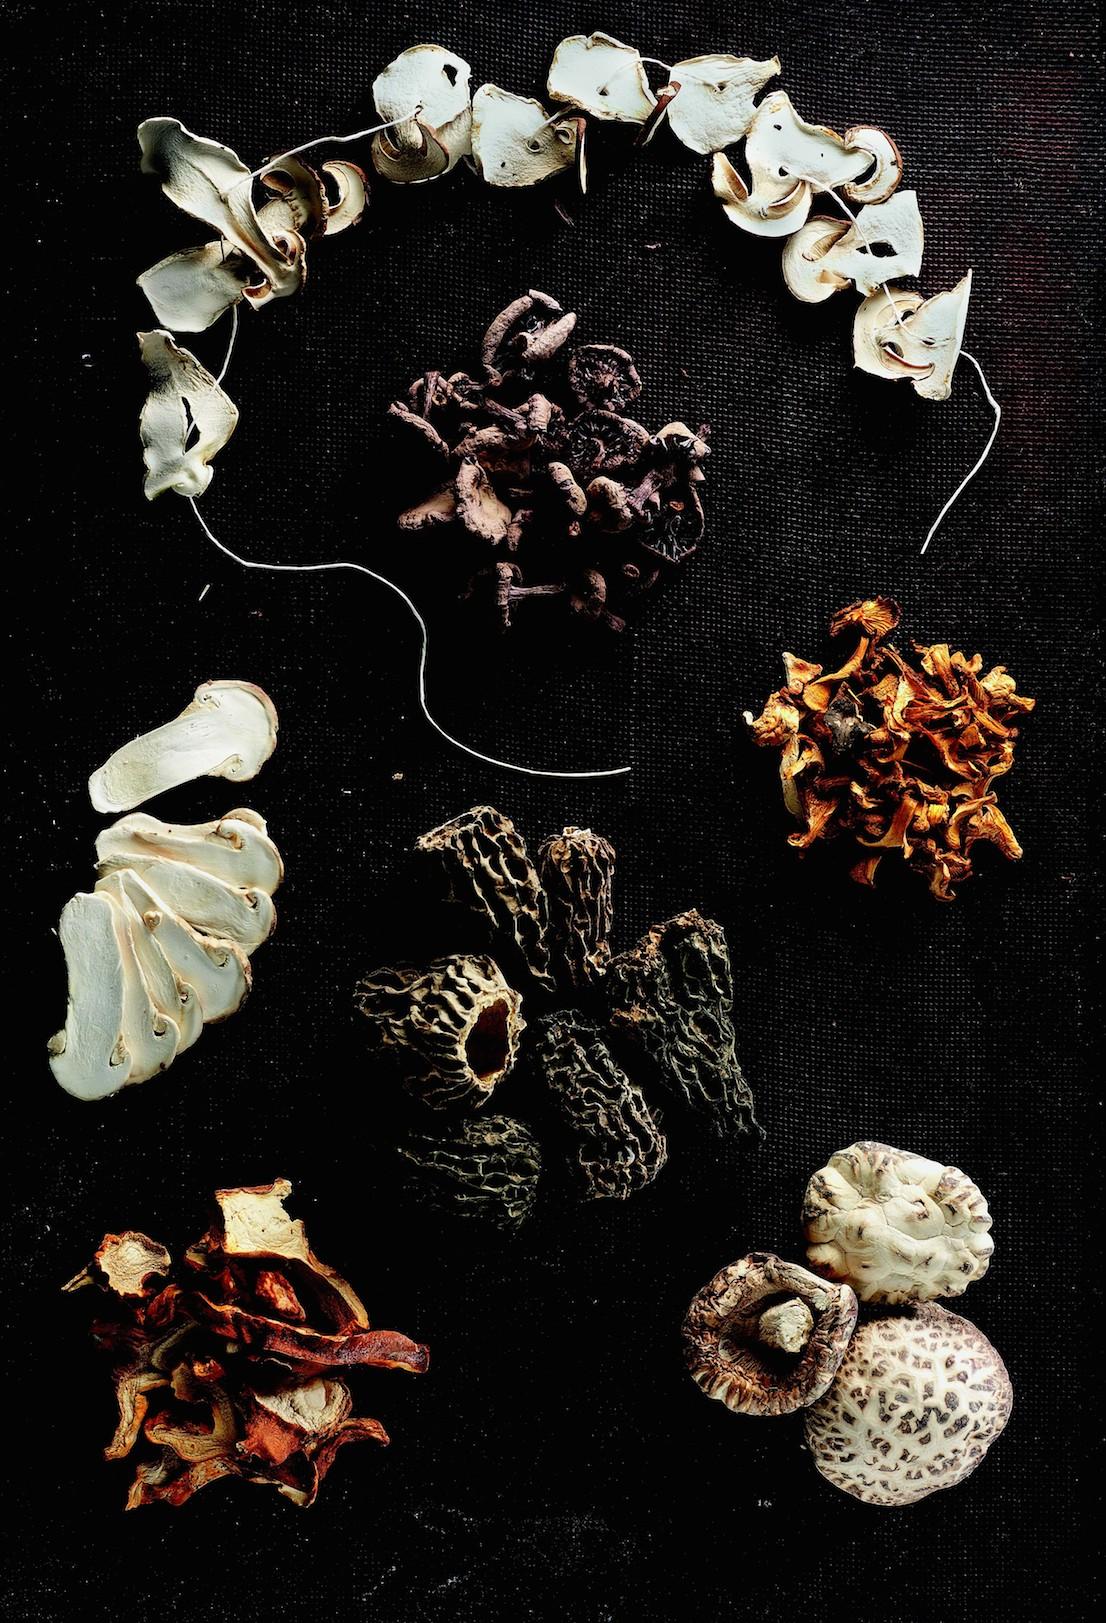 Funghi di Régis Marcon